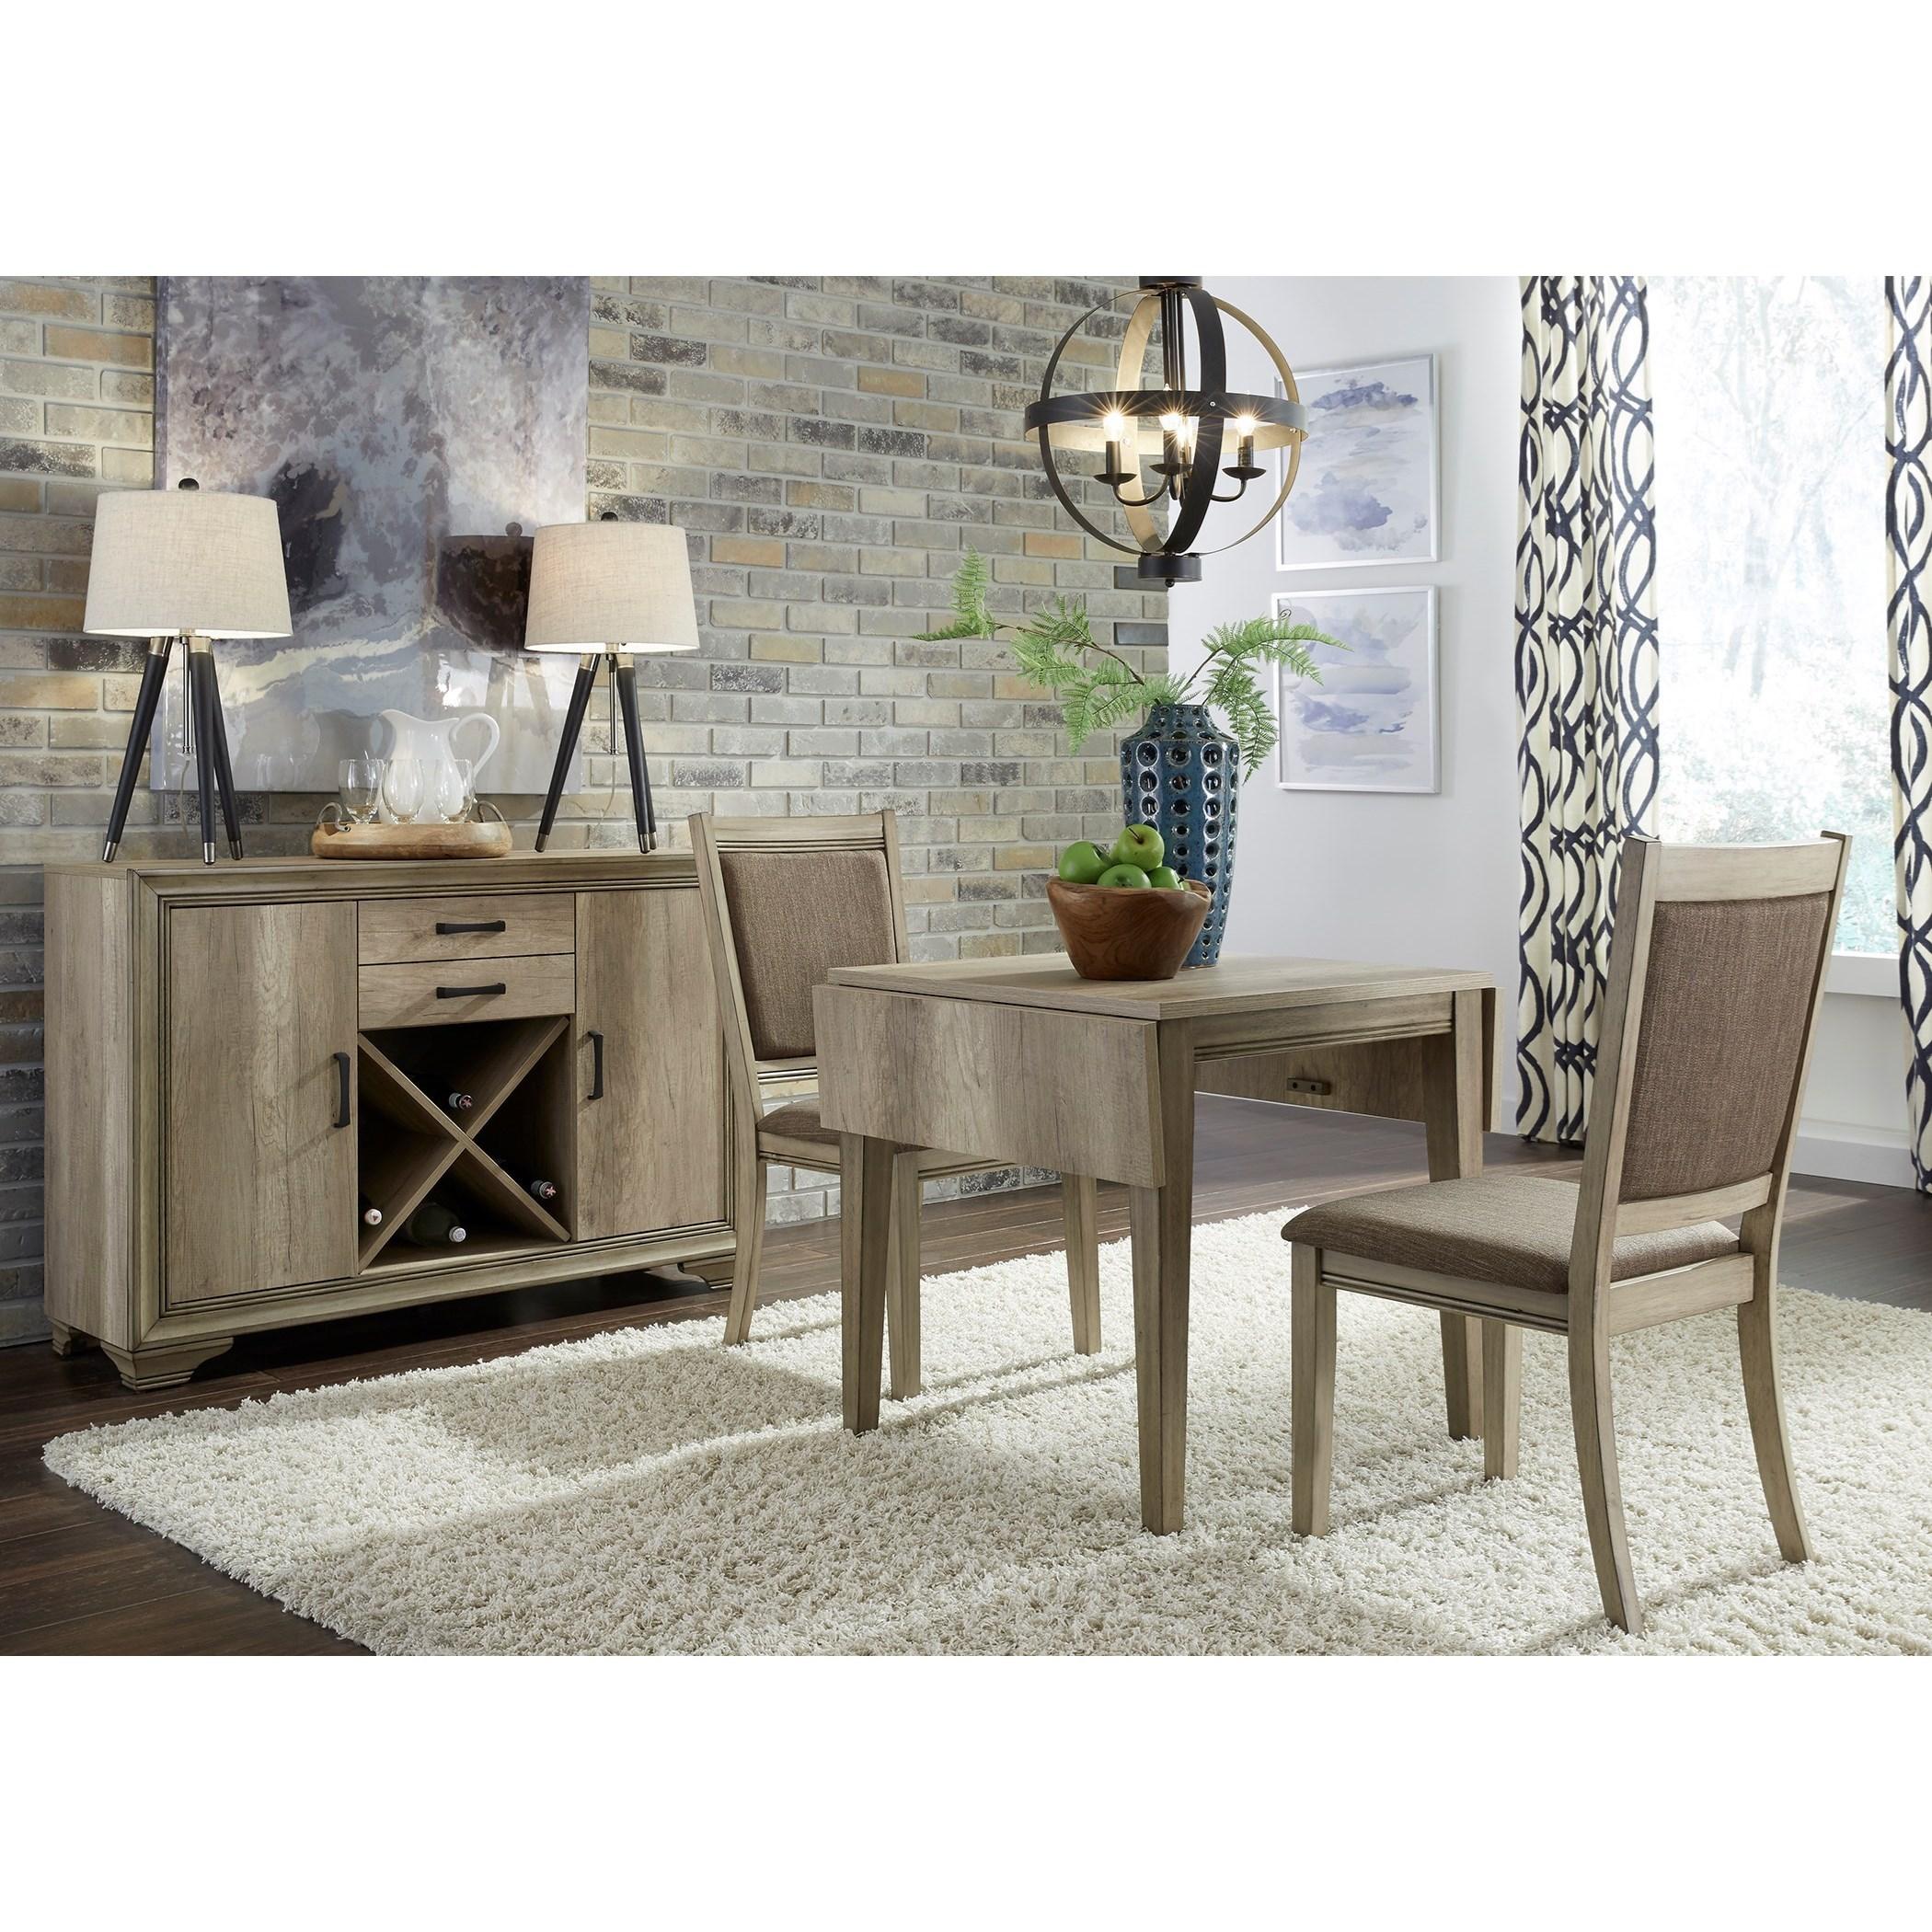 Sun Valley Opt 3 Piece Drop Leaf Set by Liberty Furniture at Lapeer Furniture & Mattress Center